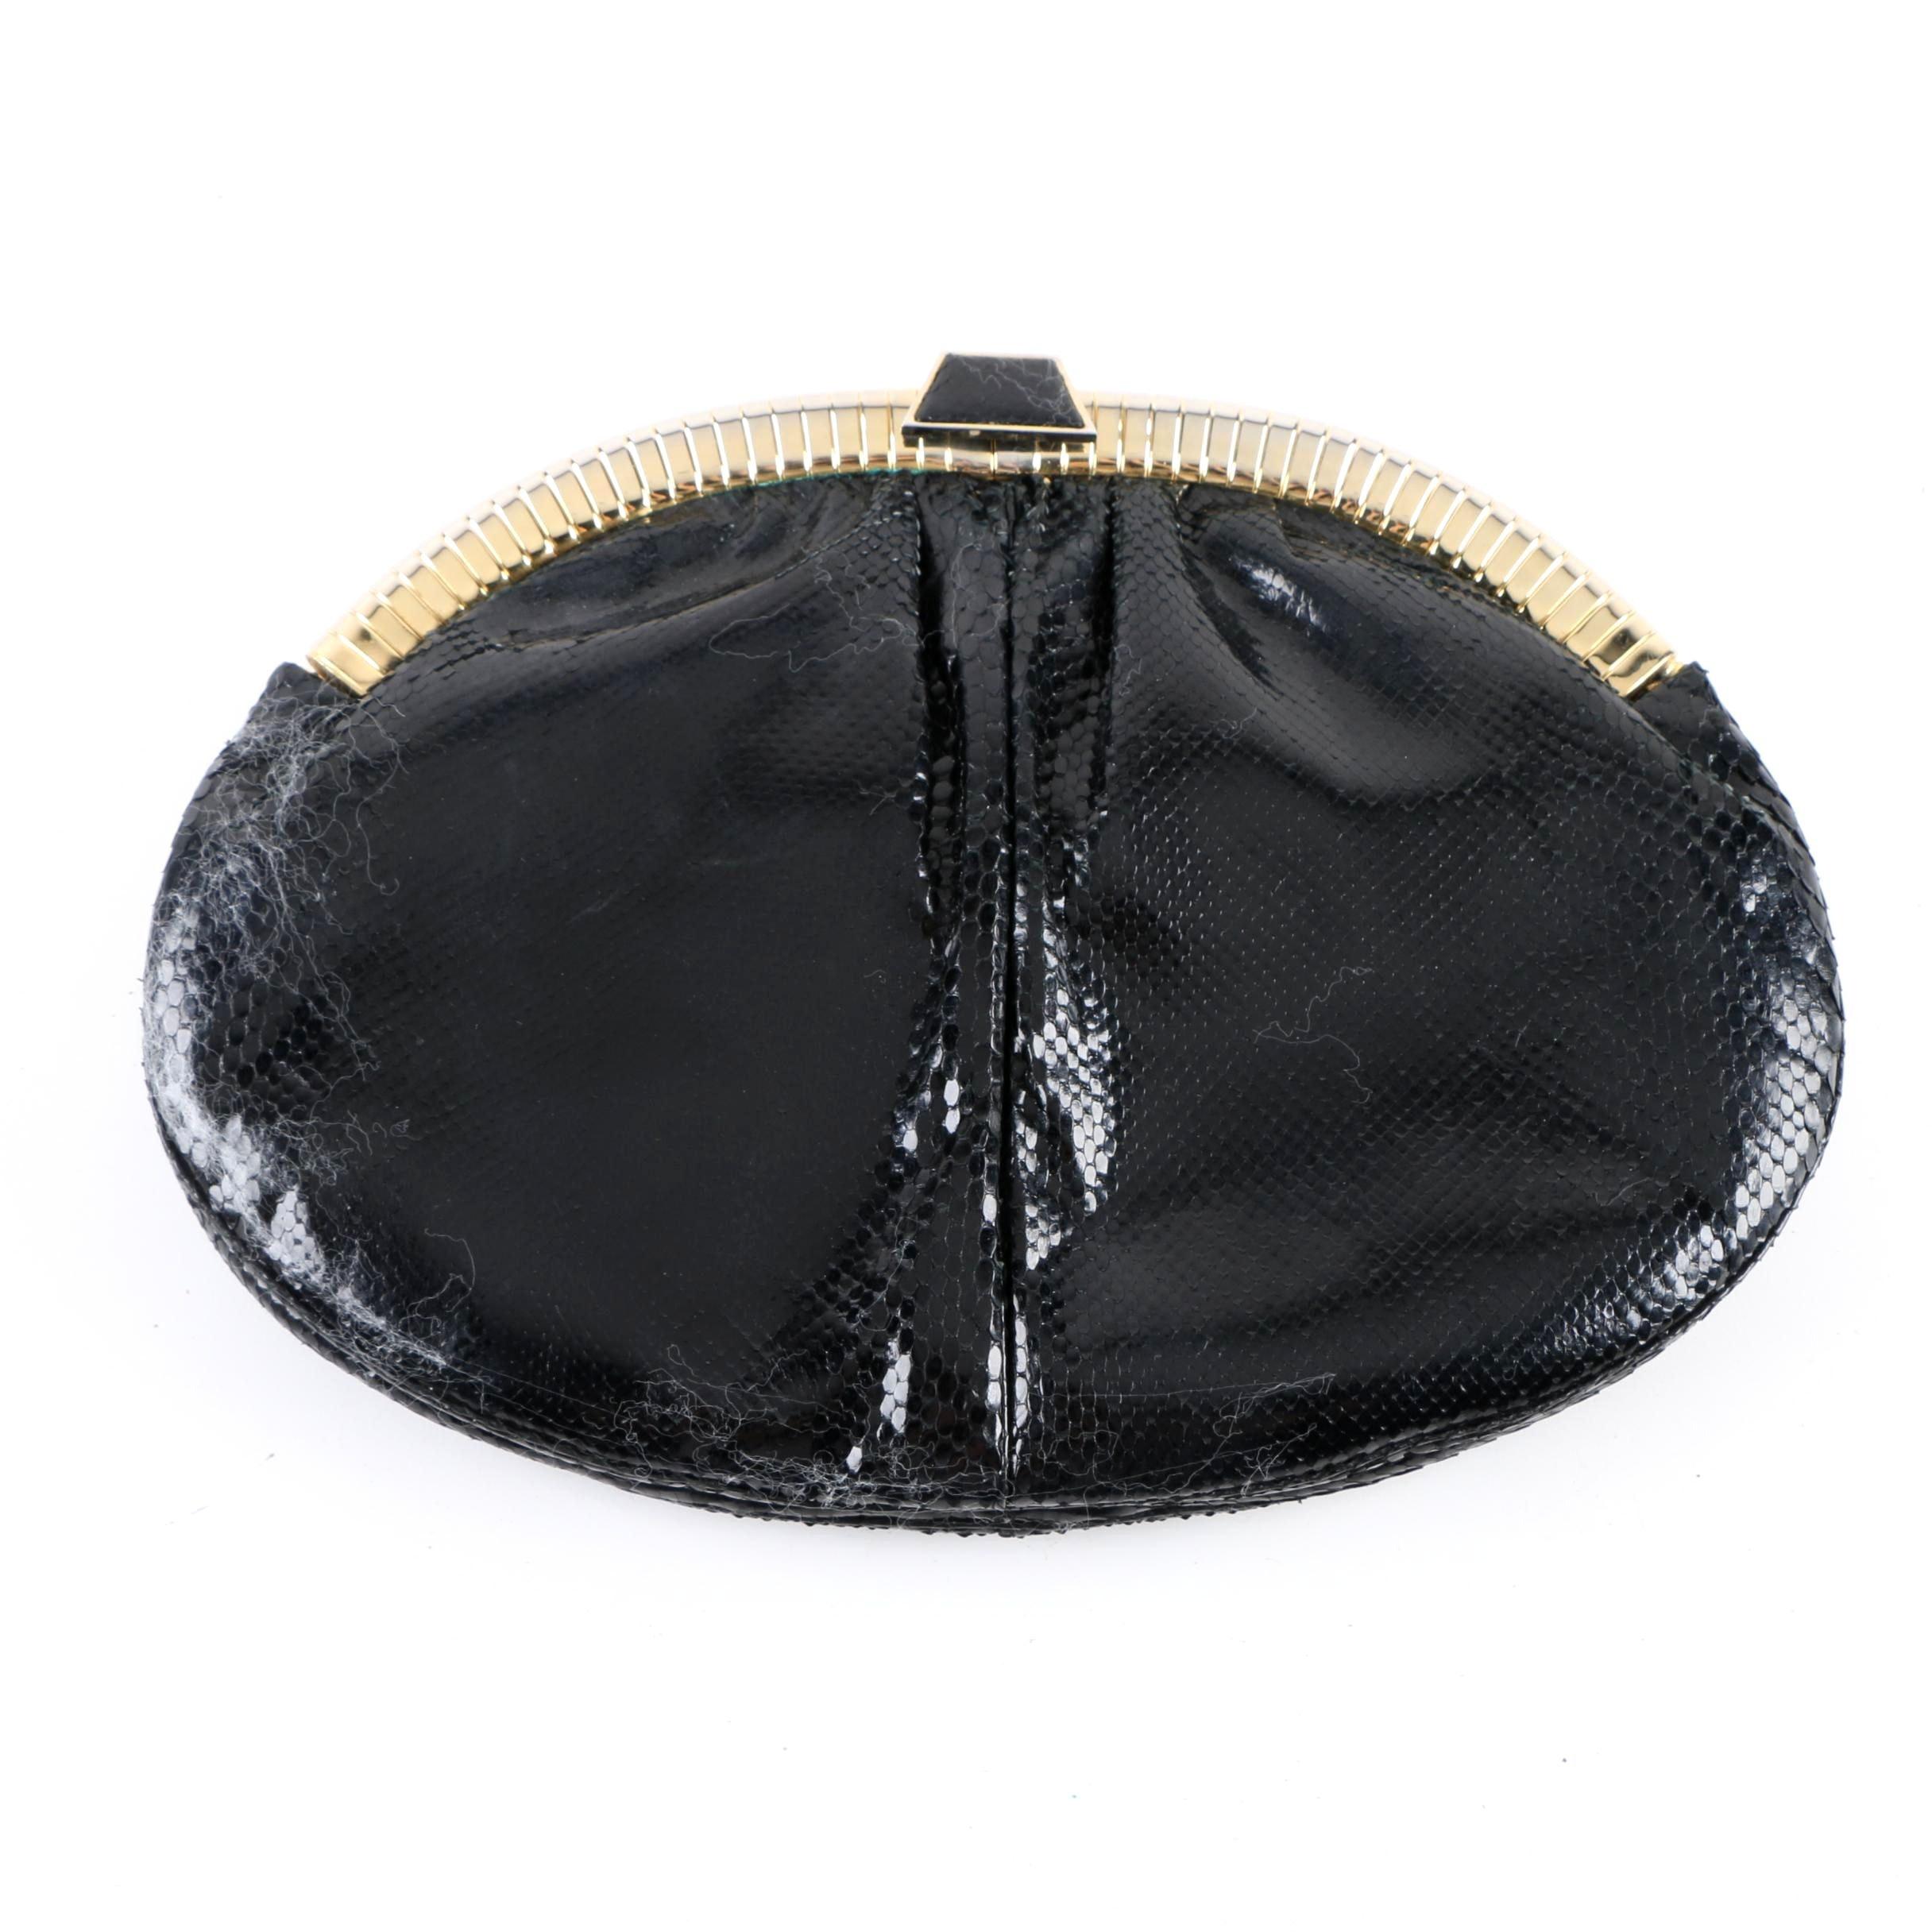 Vintage Judith Leiber Black Karung Snakeskin Clutch